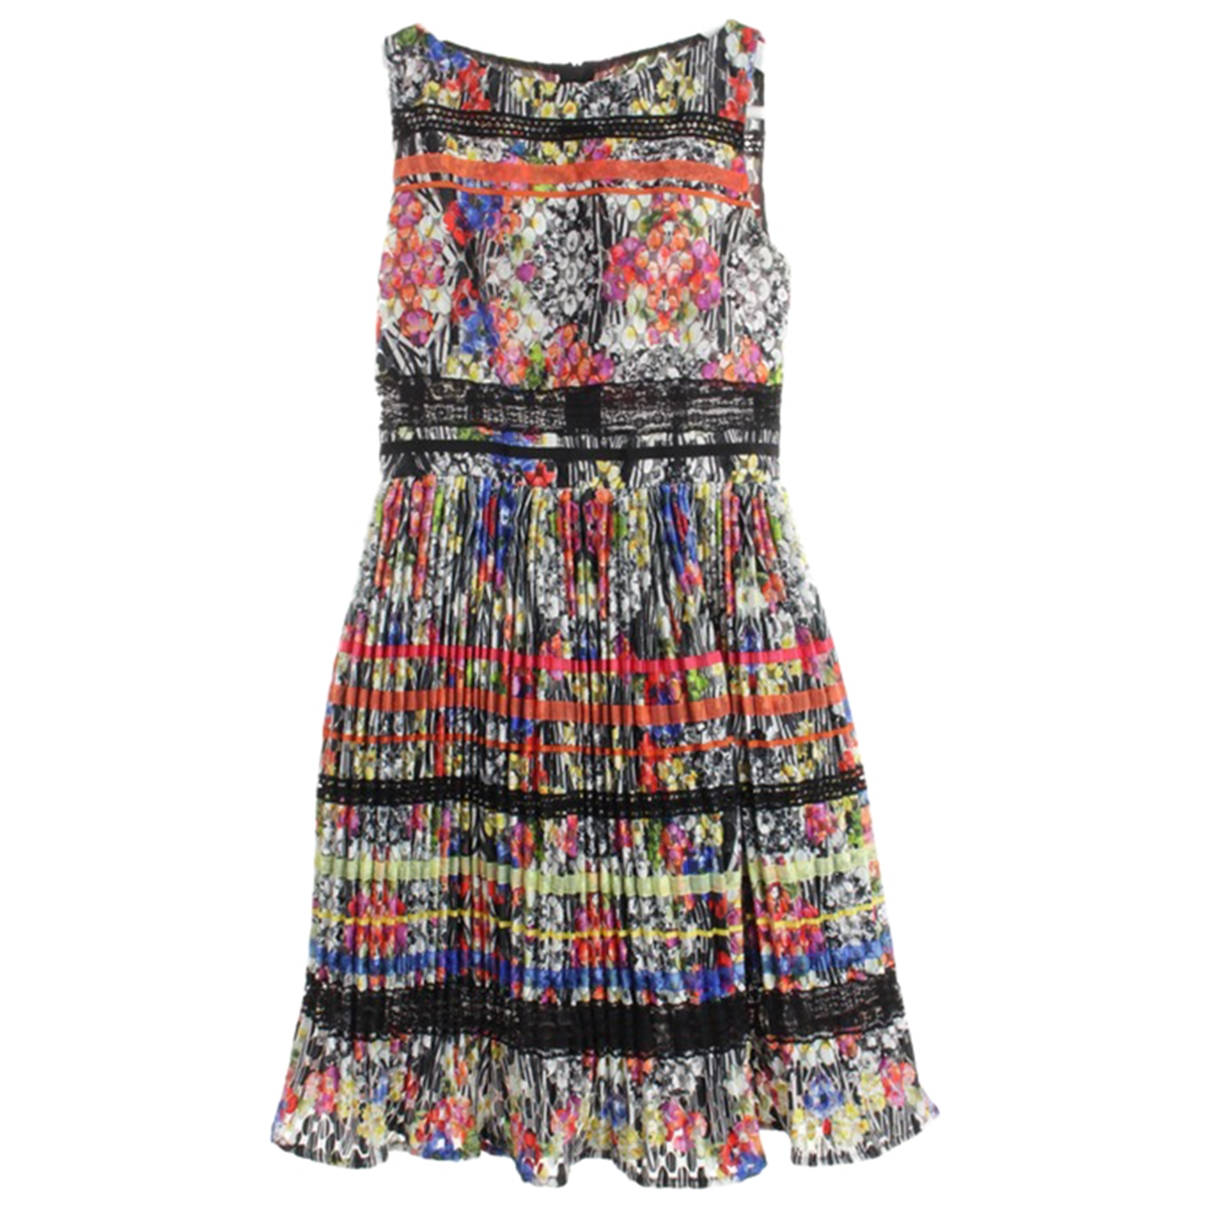 Si Jay \N Multicolour dress for Women 34 FR